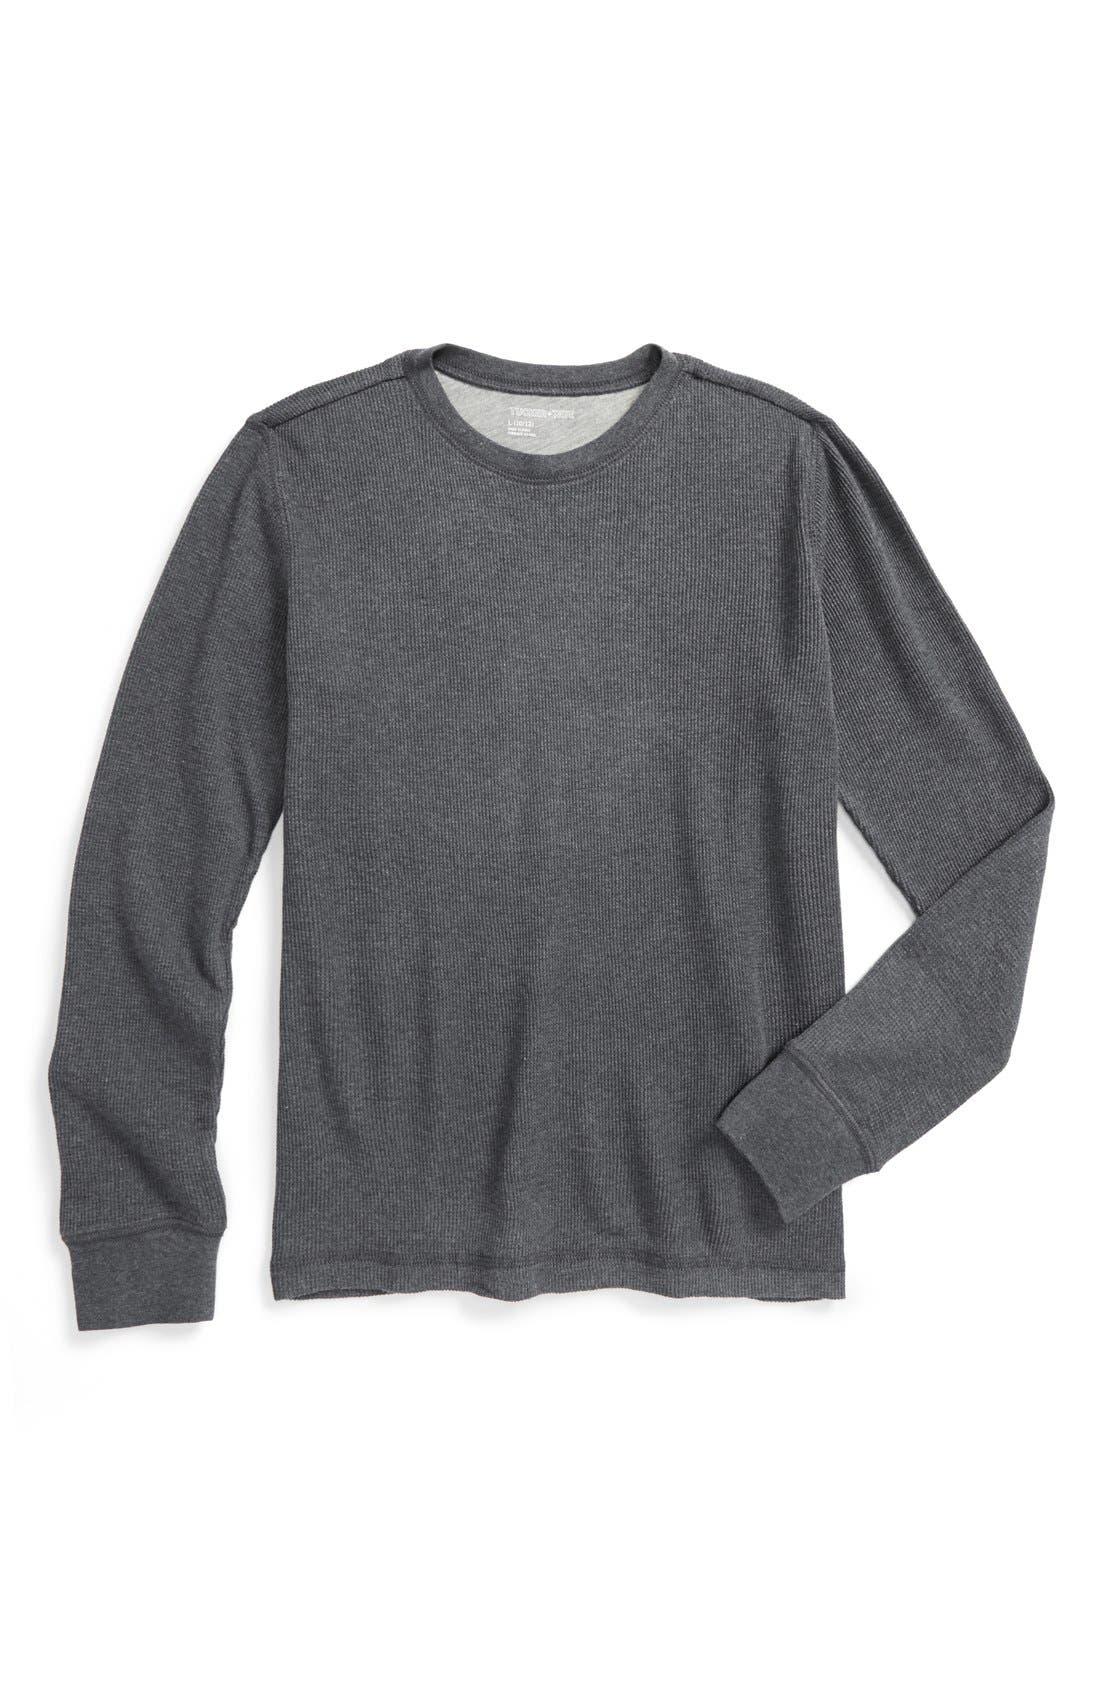 Long Sleeve Thermal T-Shirt,                         Main,                         color, 030